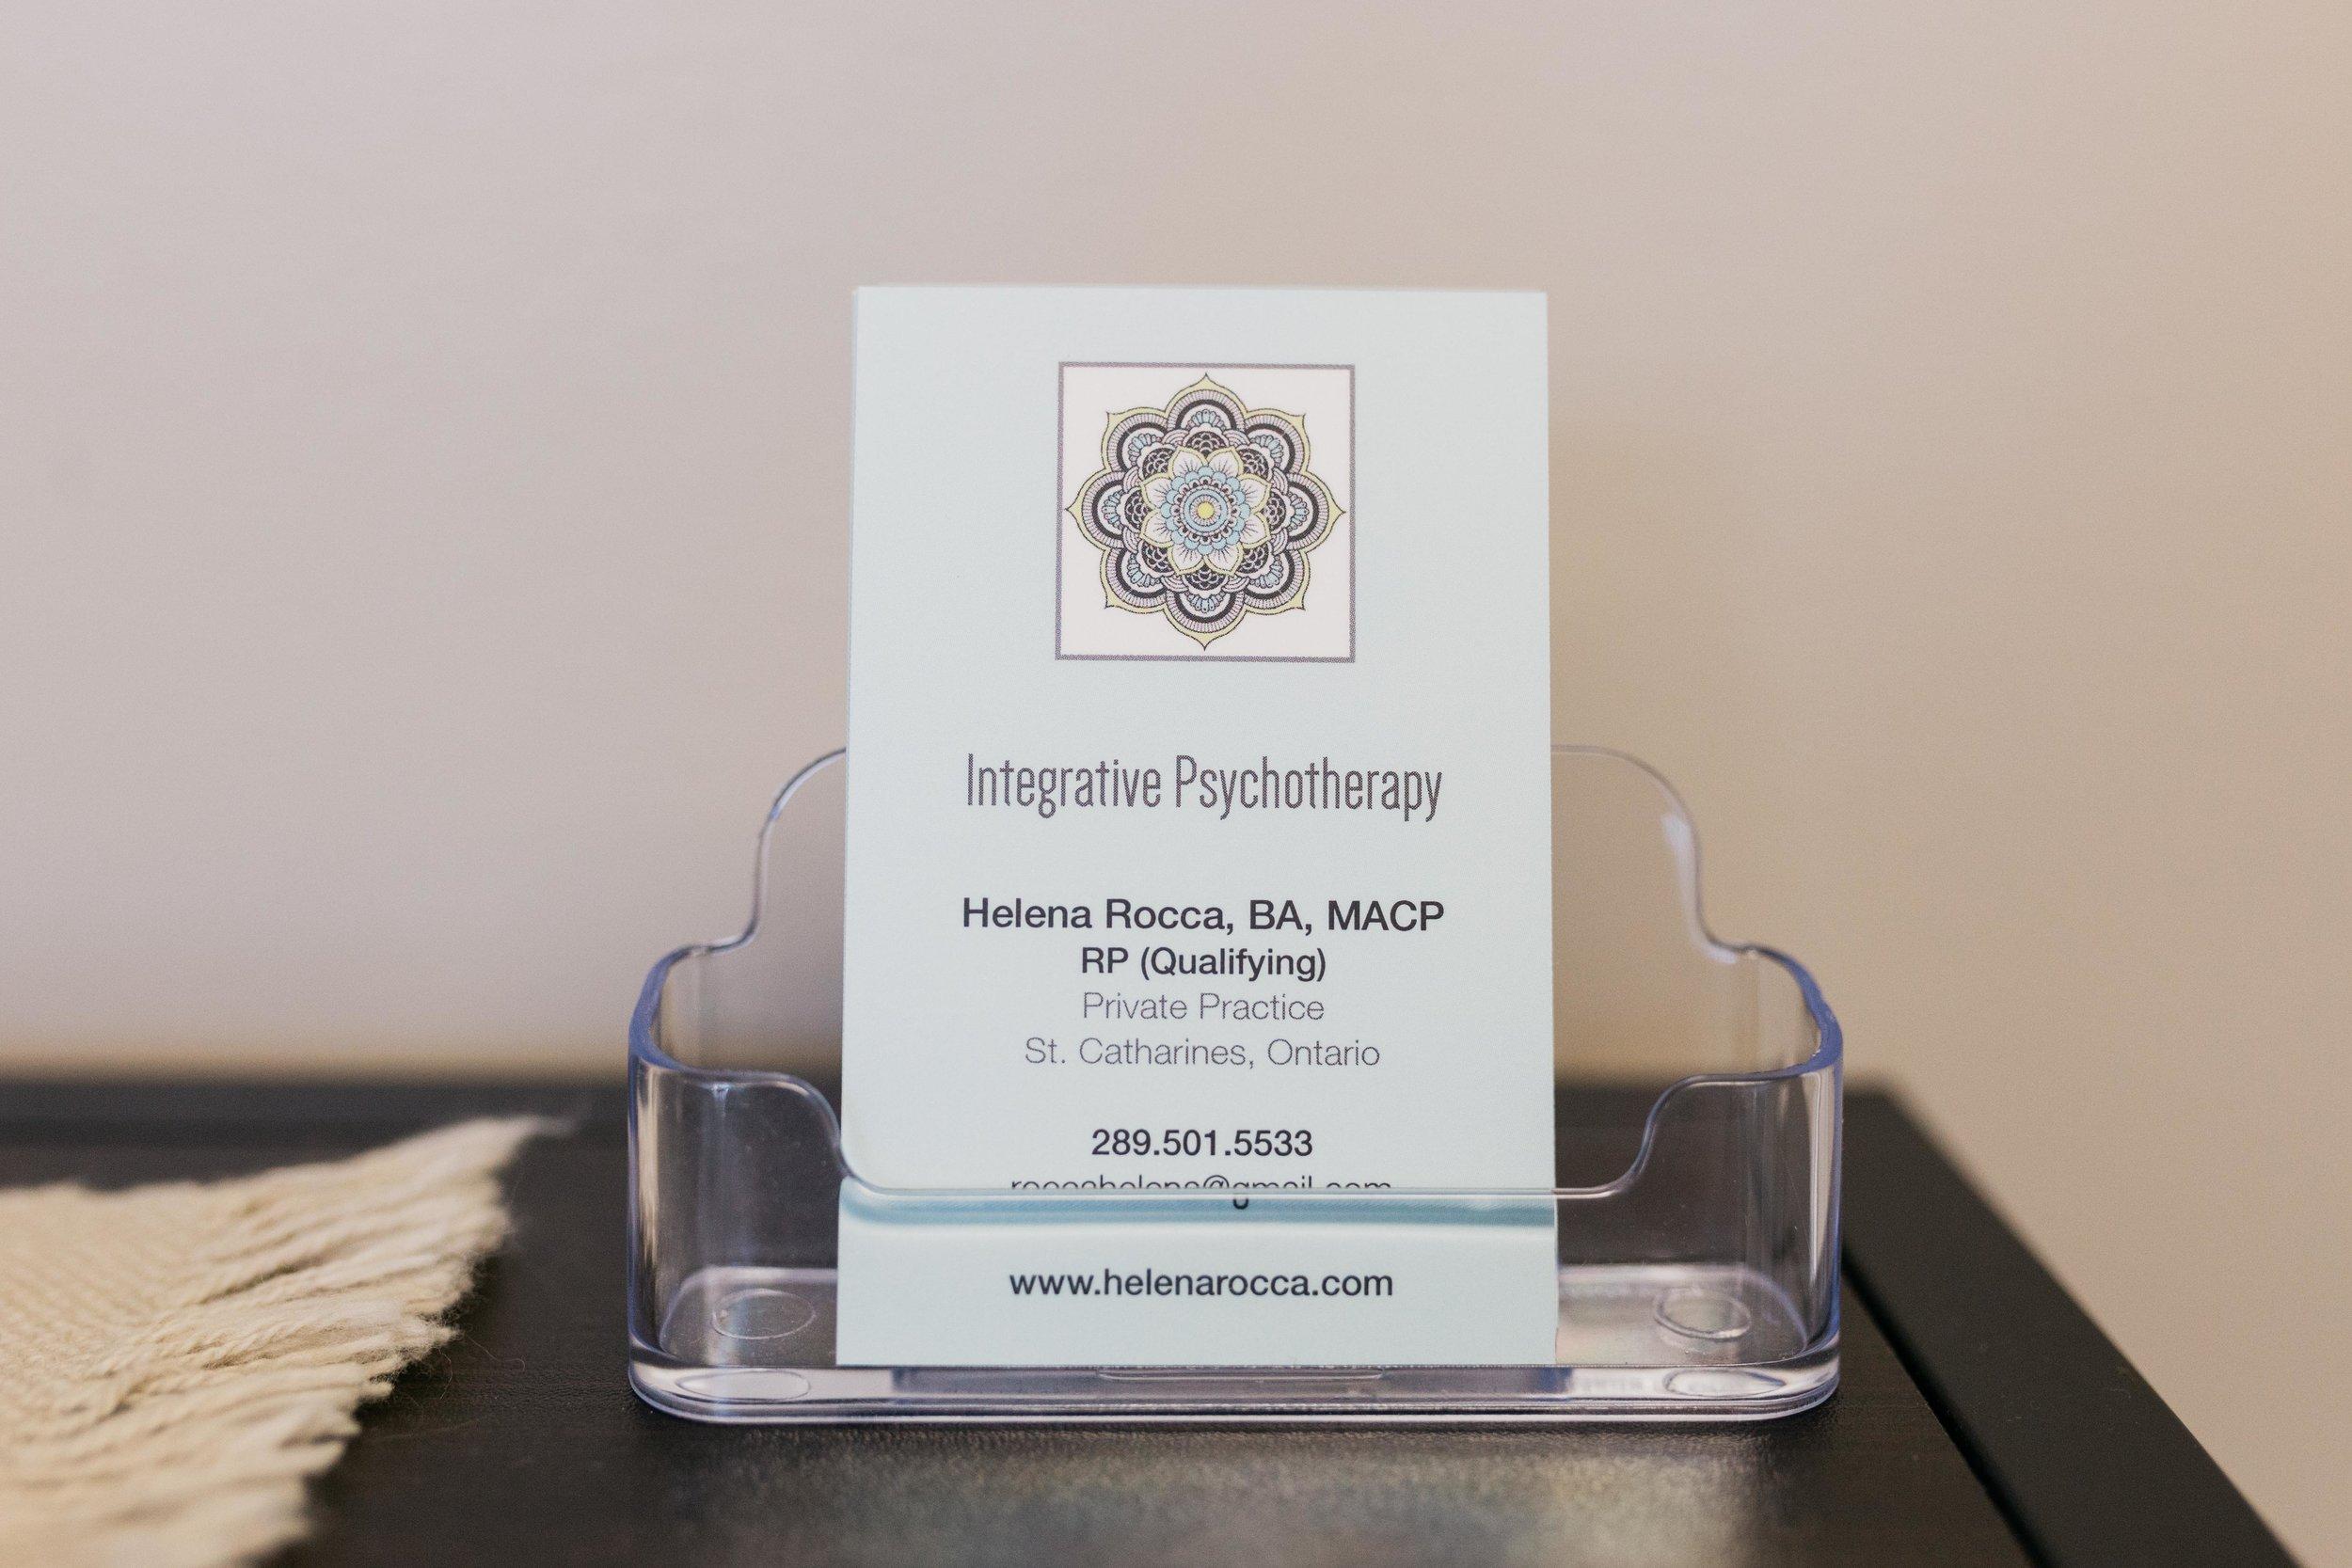 10HelenaRocca-St.Catharines-Niagara-Psychotherapy-4992.jpg